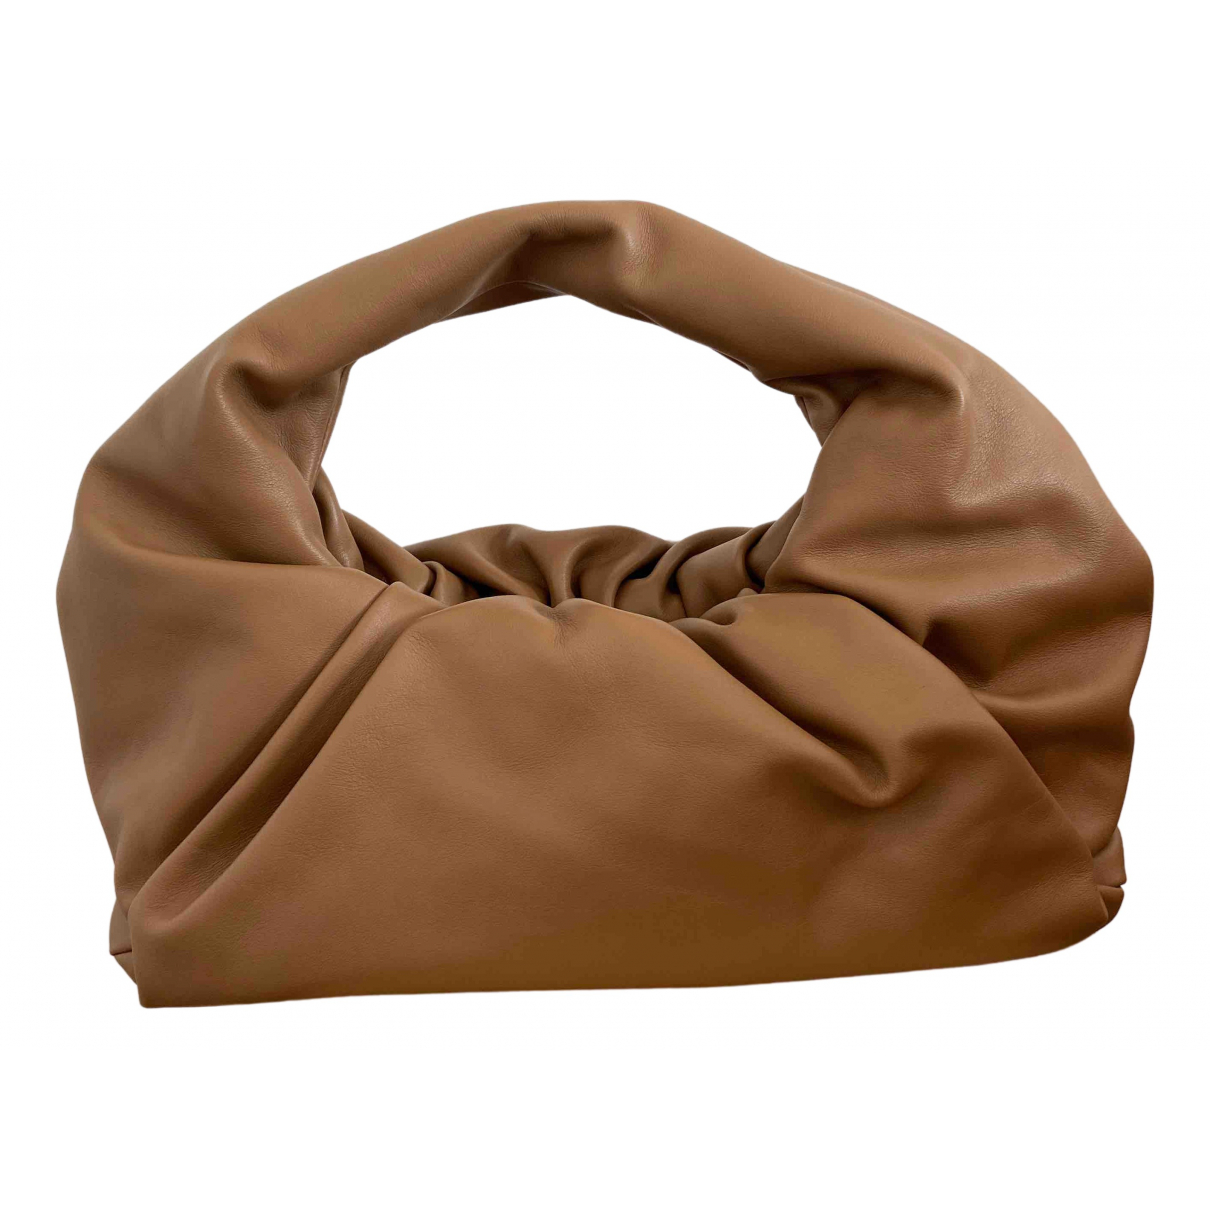 Bottega Veneta The Shoulder Pouch Camel Leather handbag for Women \N